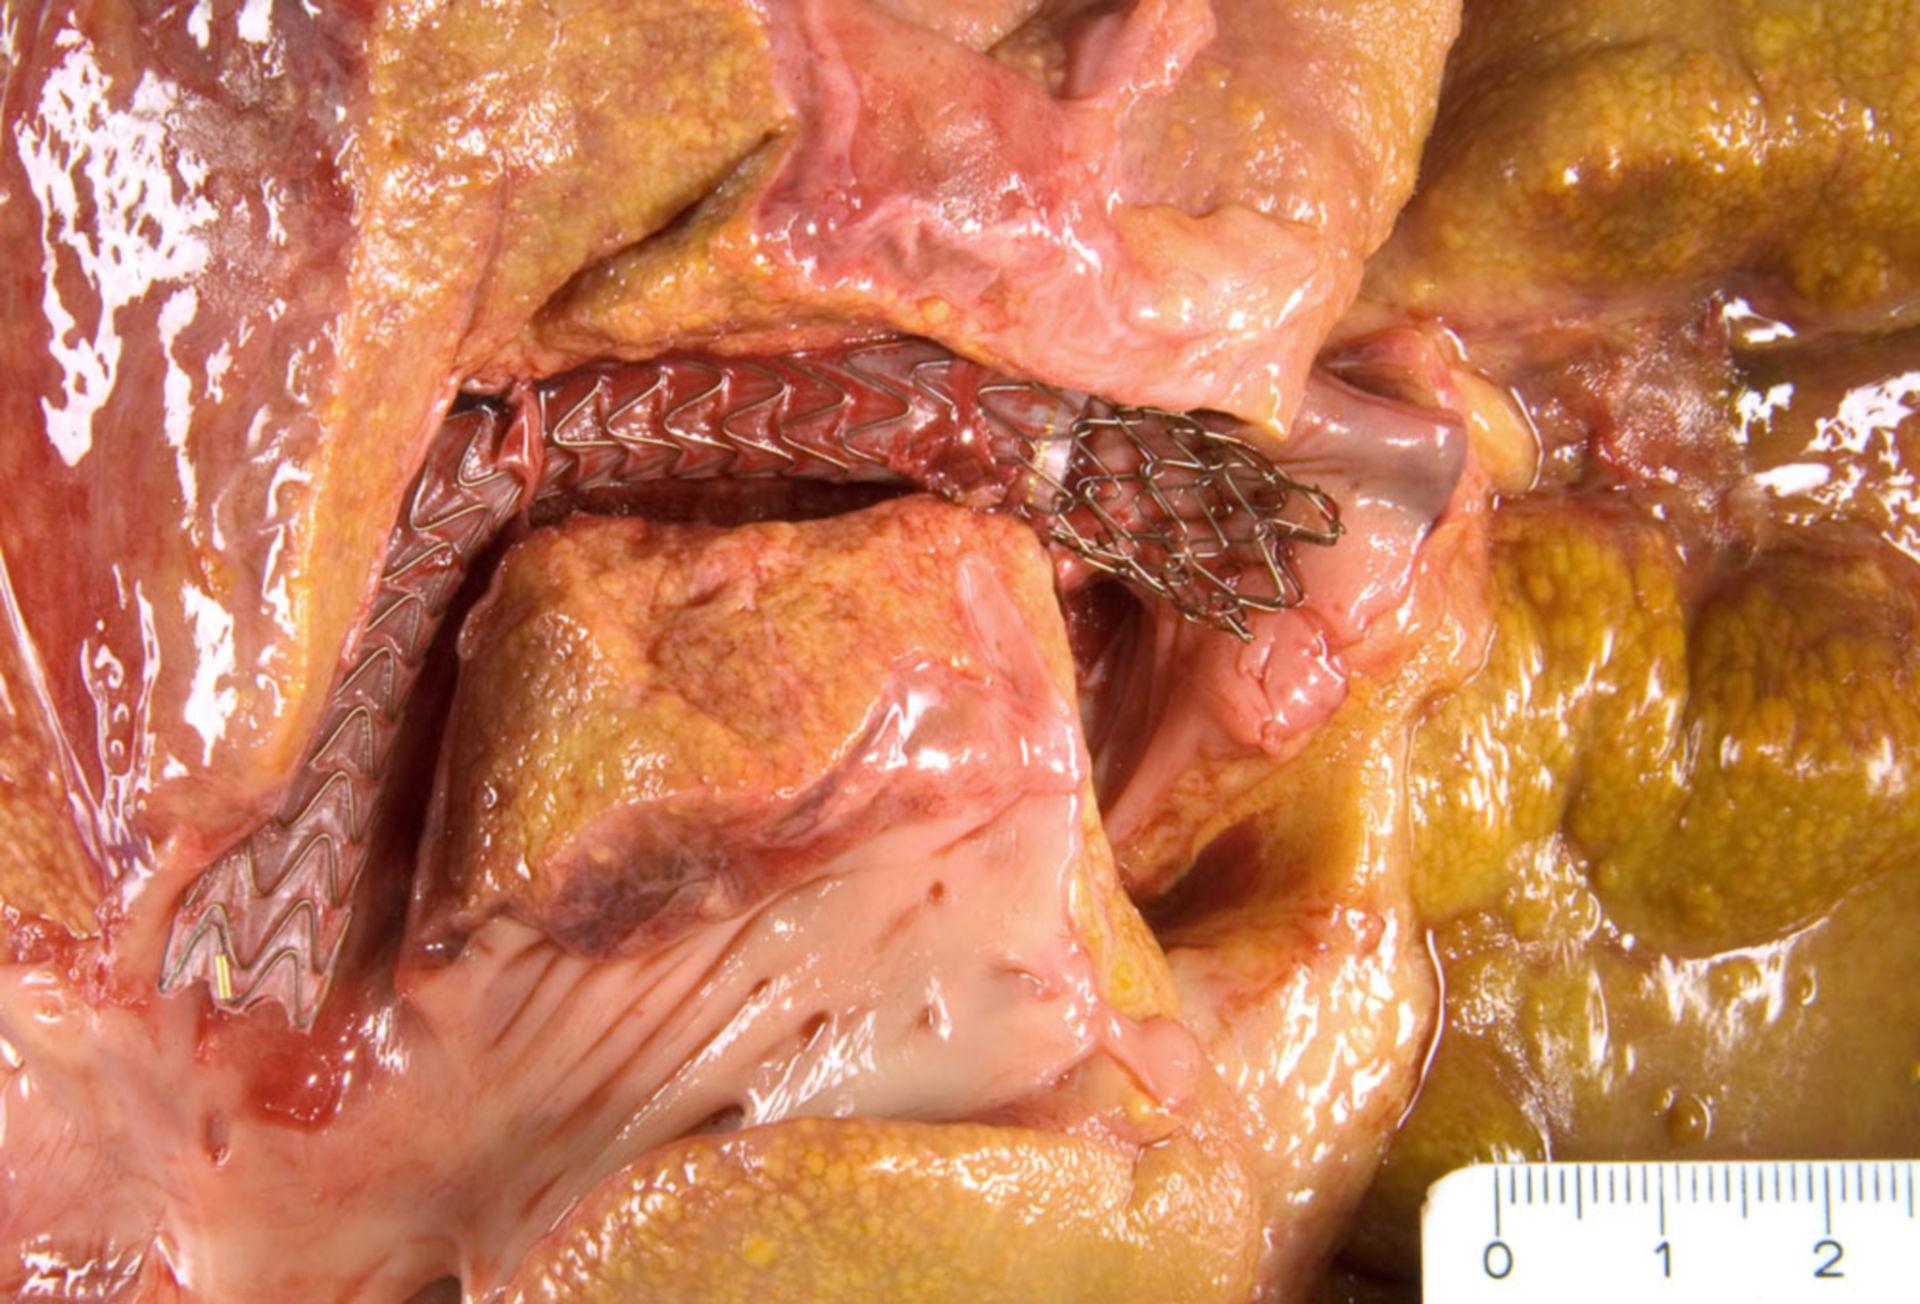 Transjugular intrahepatic portosystemic shunt, TIPS (Detail)